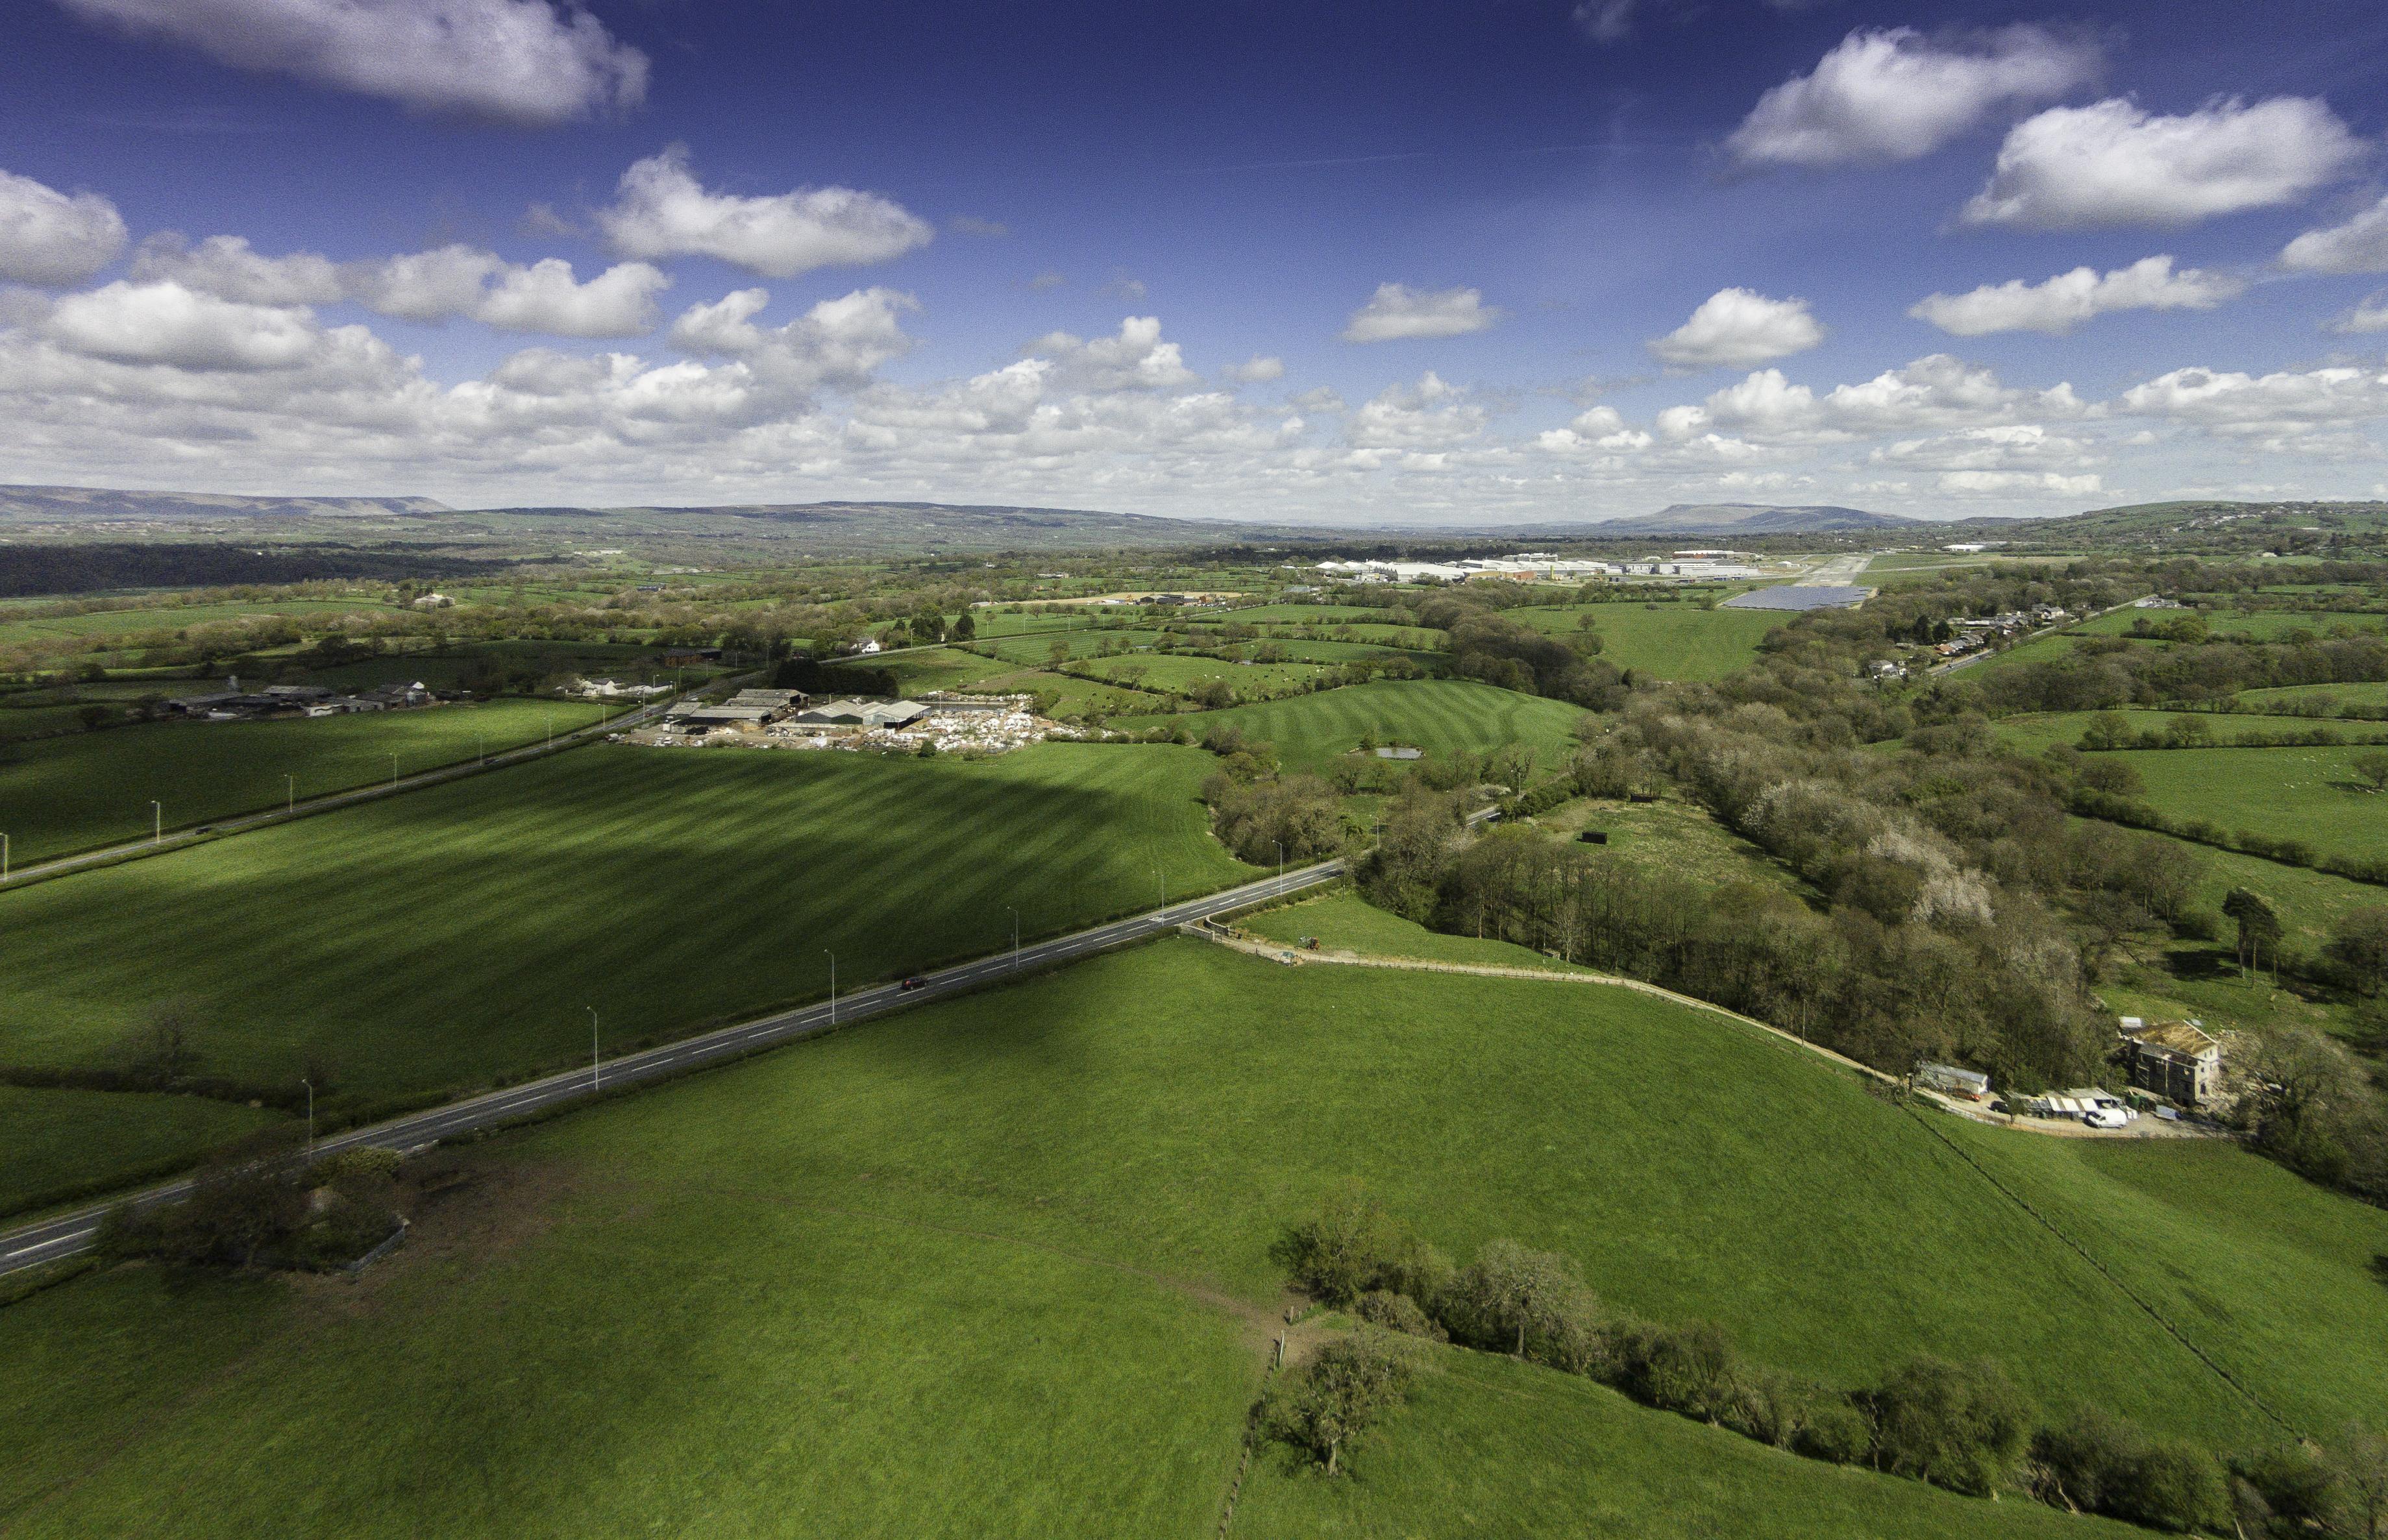 Samlesbury Lancashire